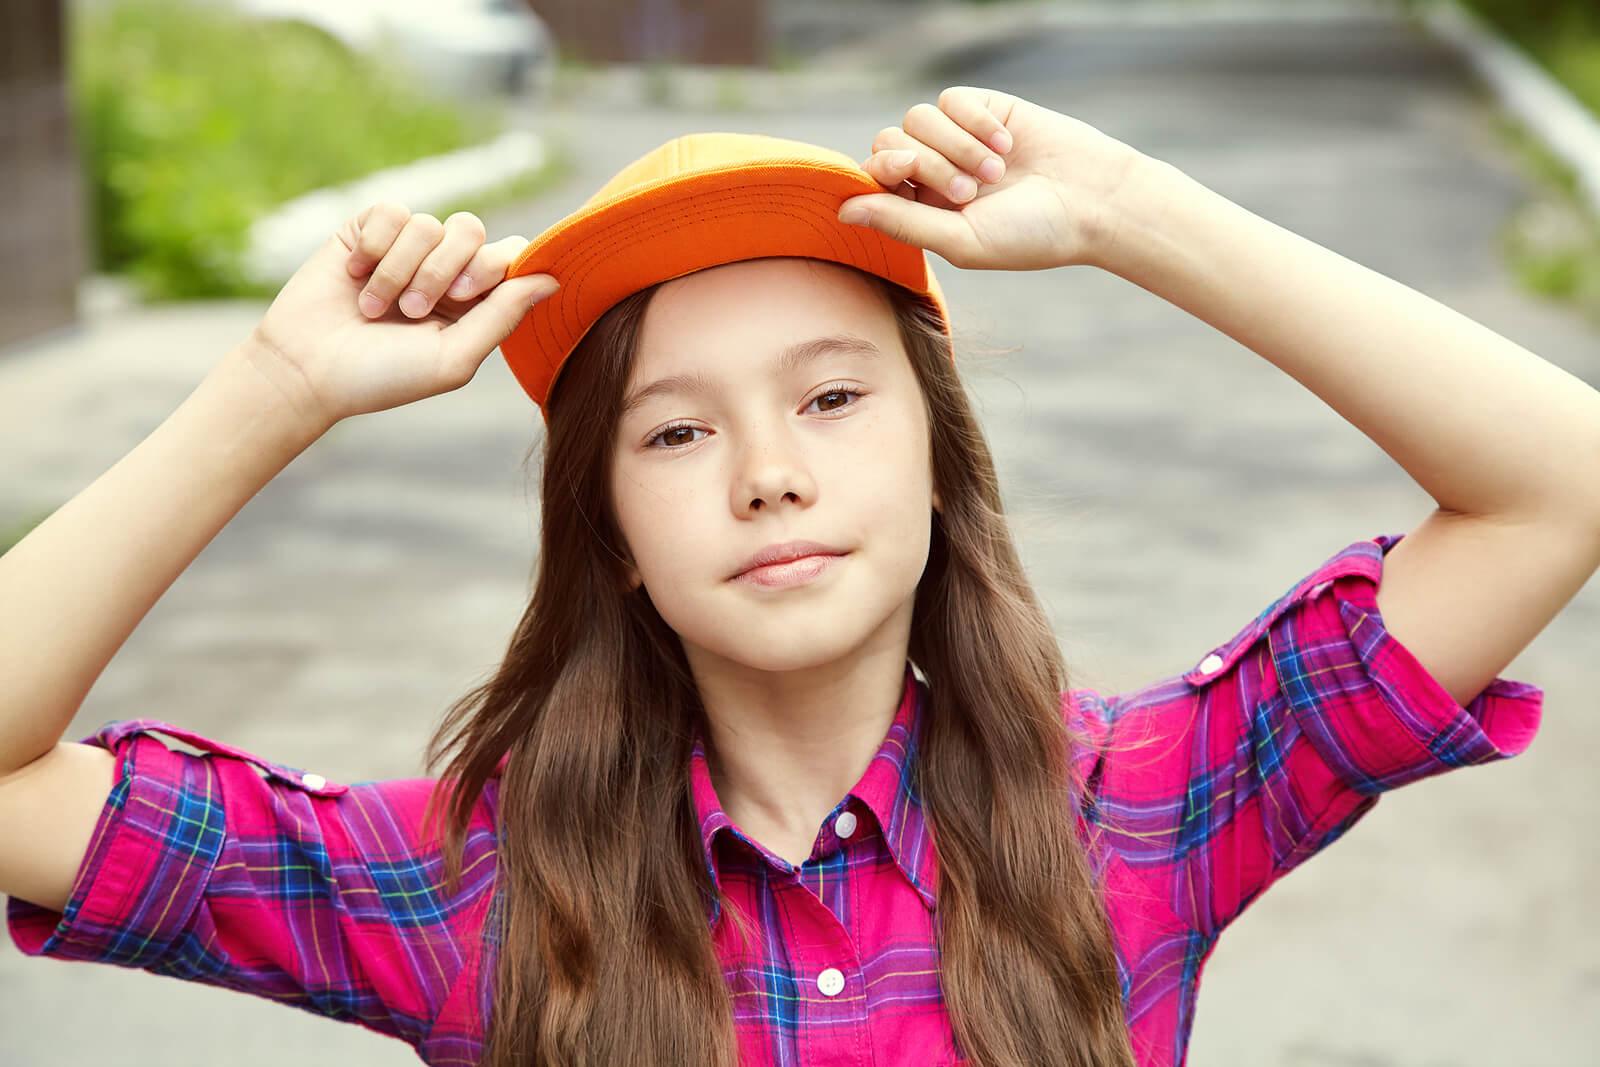 Chica adolescente con una gorra posando.